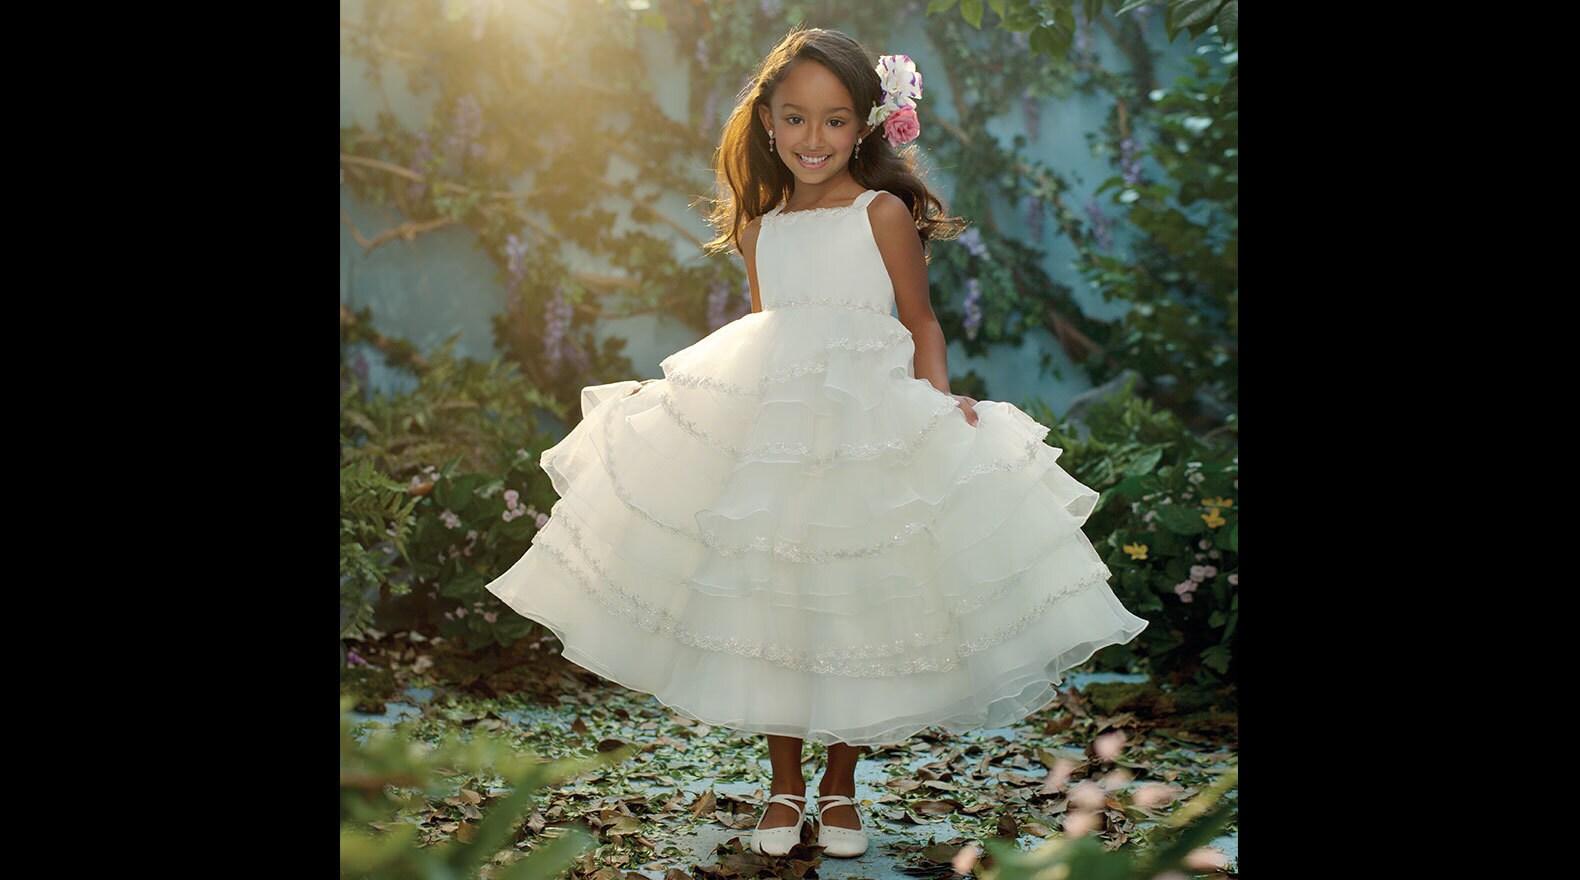 Girl wearing a Tiana inspired princess dress